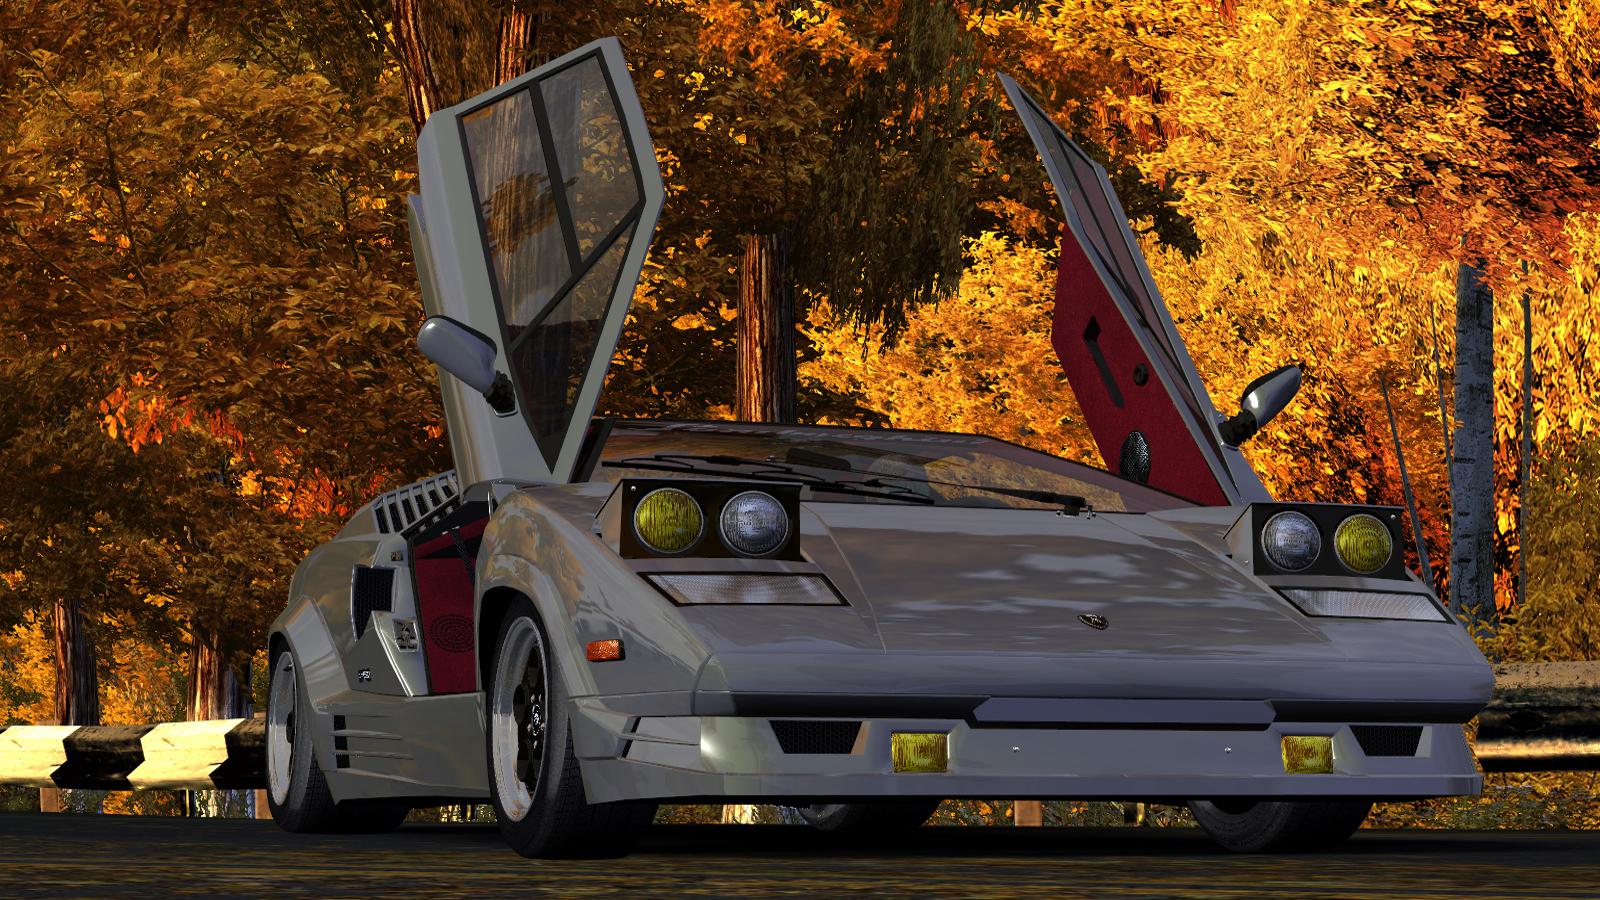 Lamborghini Countach 25th Anniversary by Alex.Ka. - Need for Speed: Most Wanted (2005) Lamborghini Countach, Автомобиль